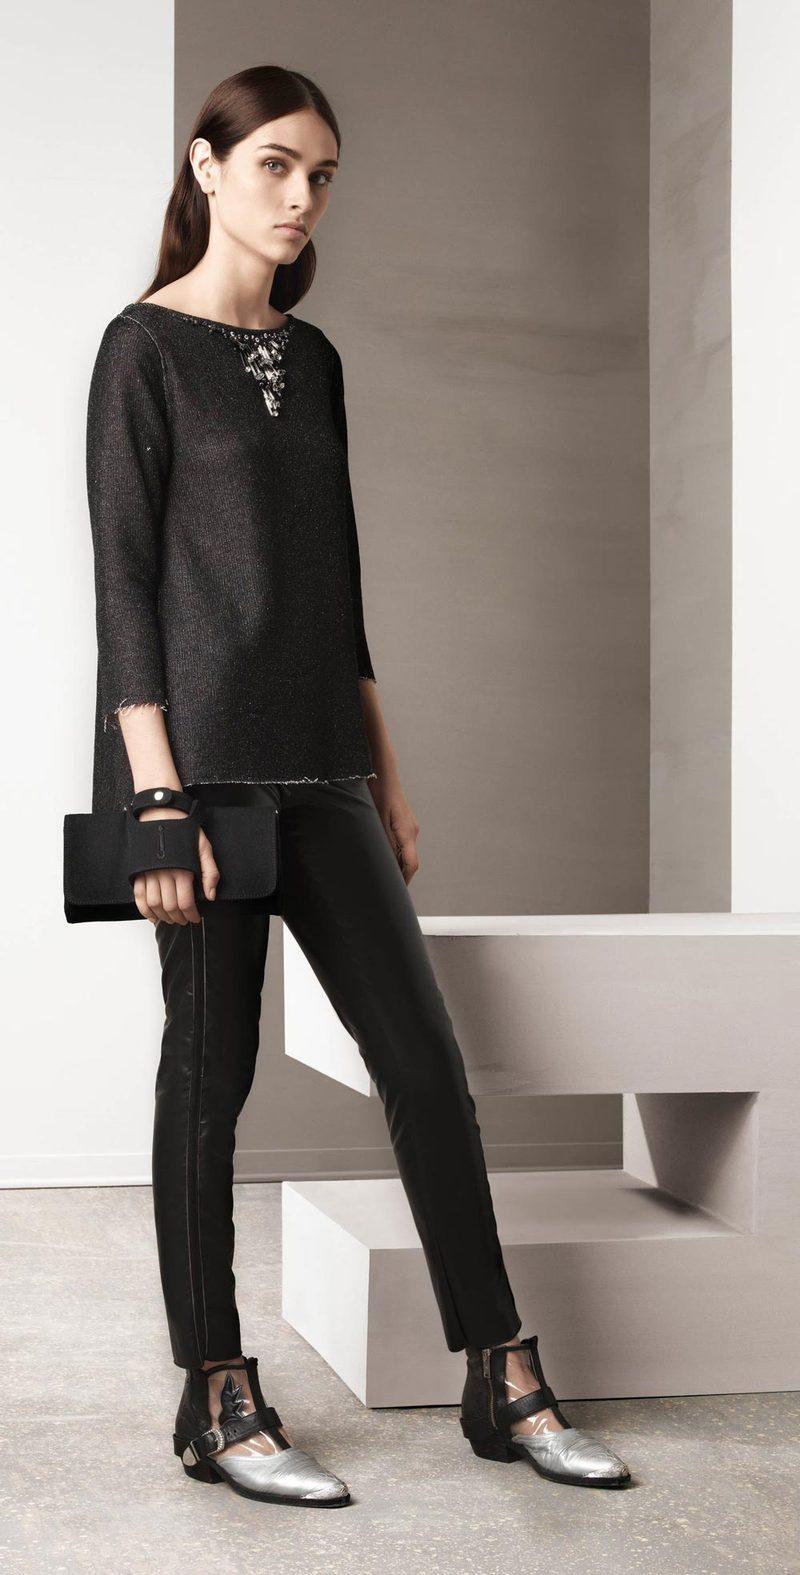 Black leggings with side stripes